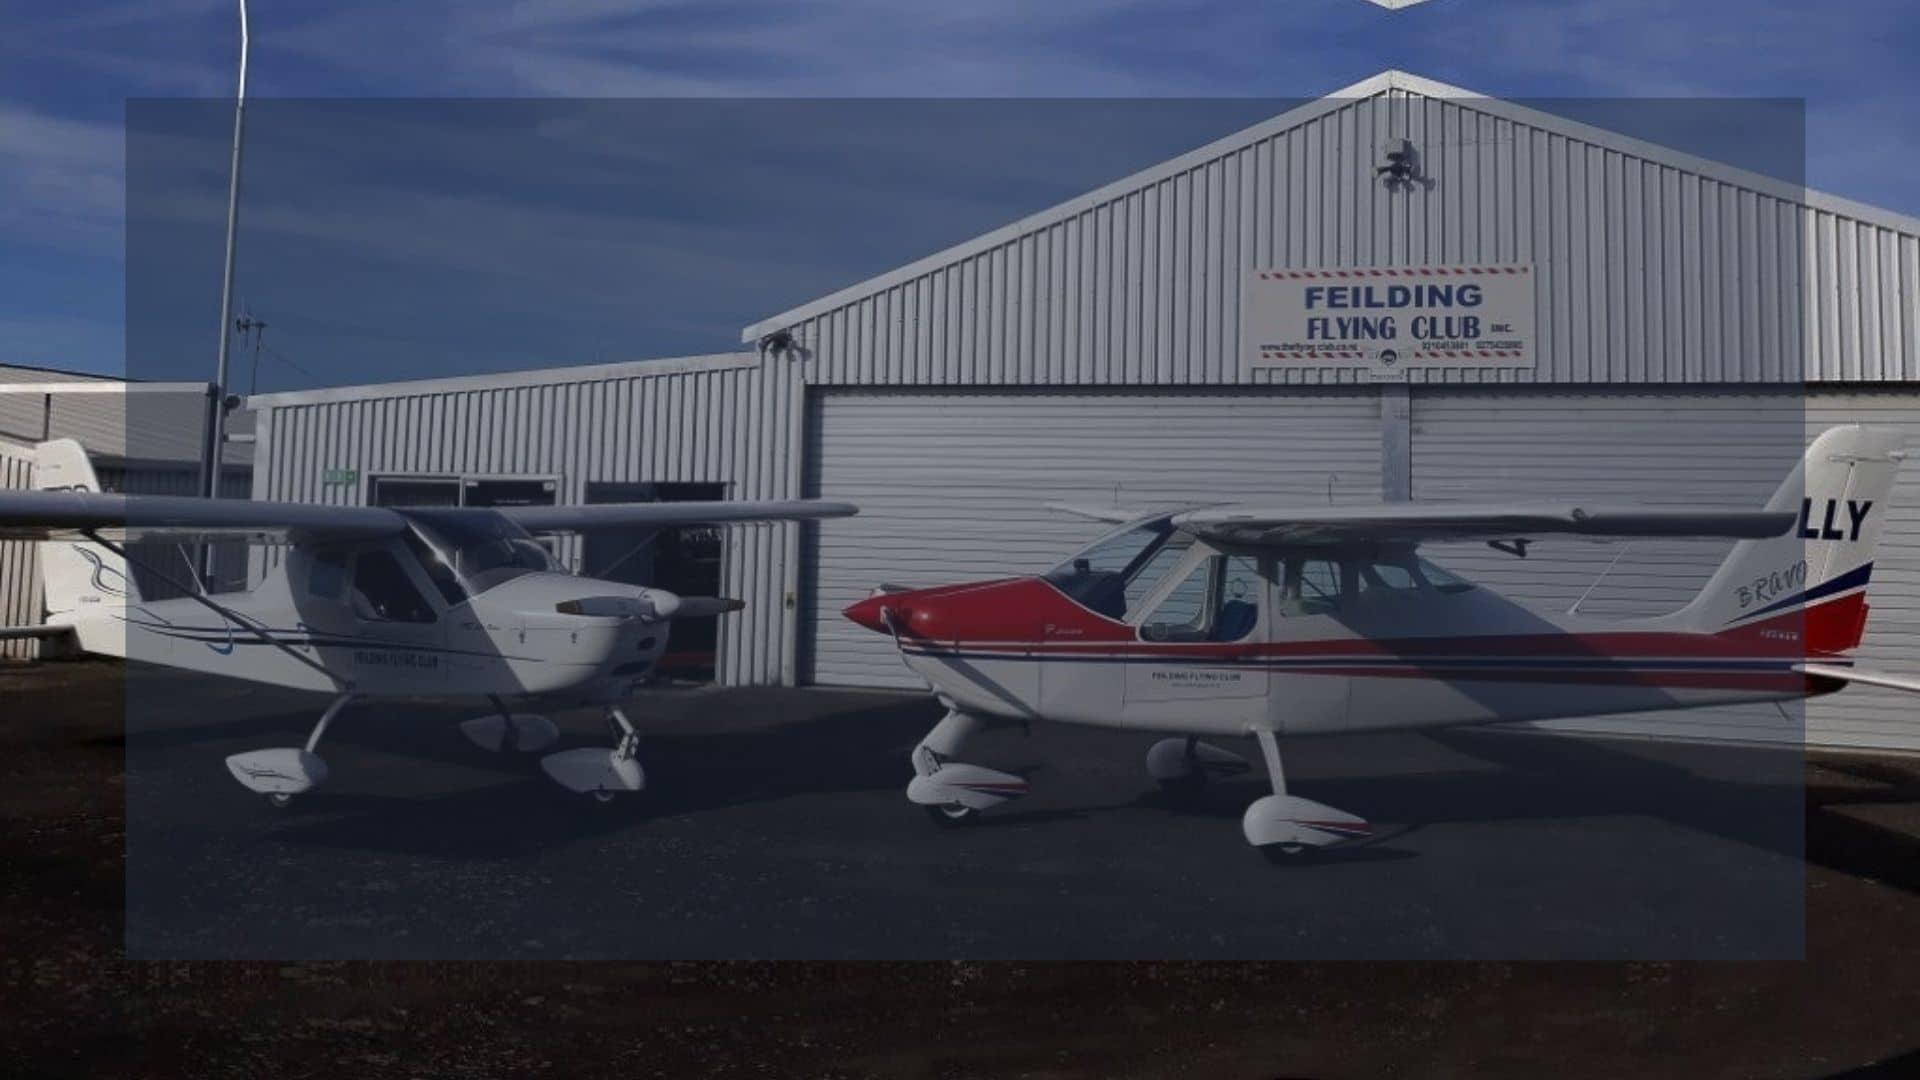 Feilding Flying Club Hangar and Planes